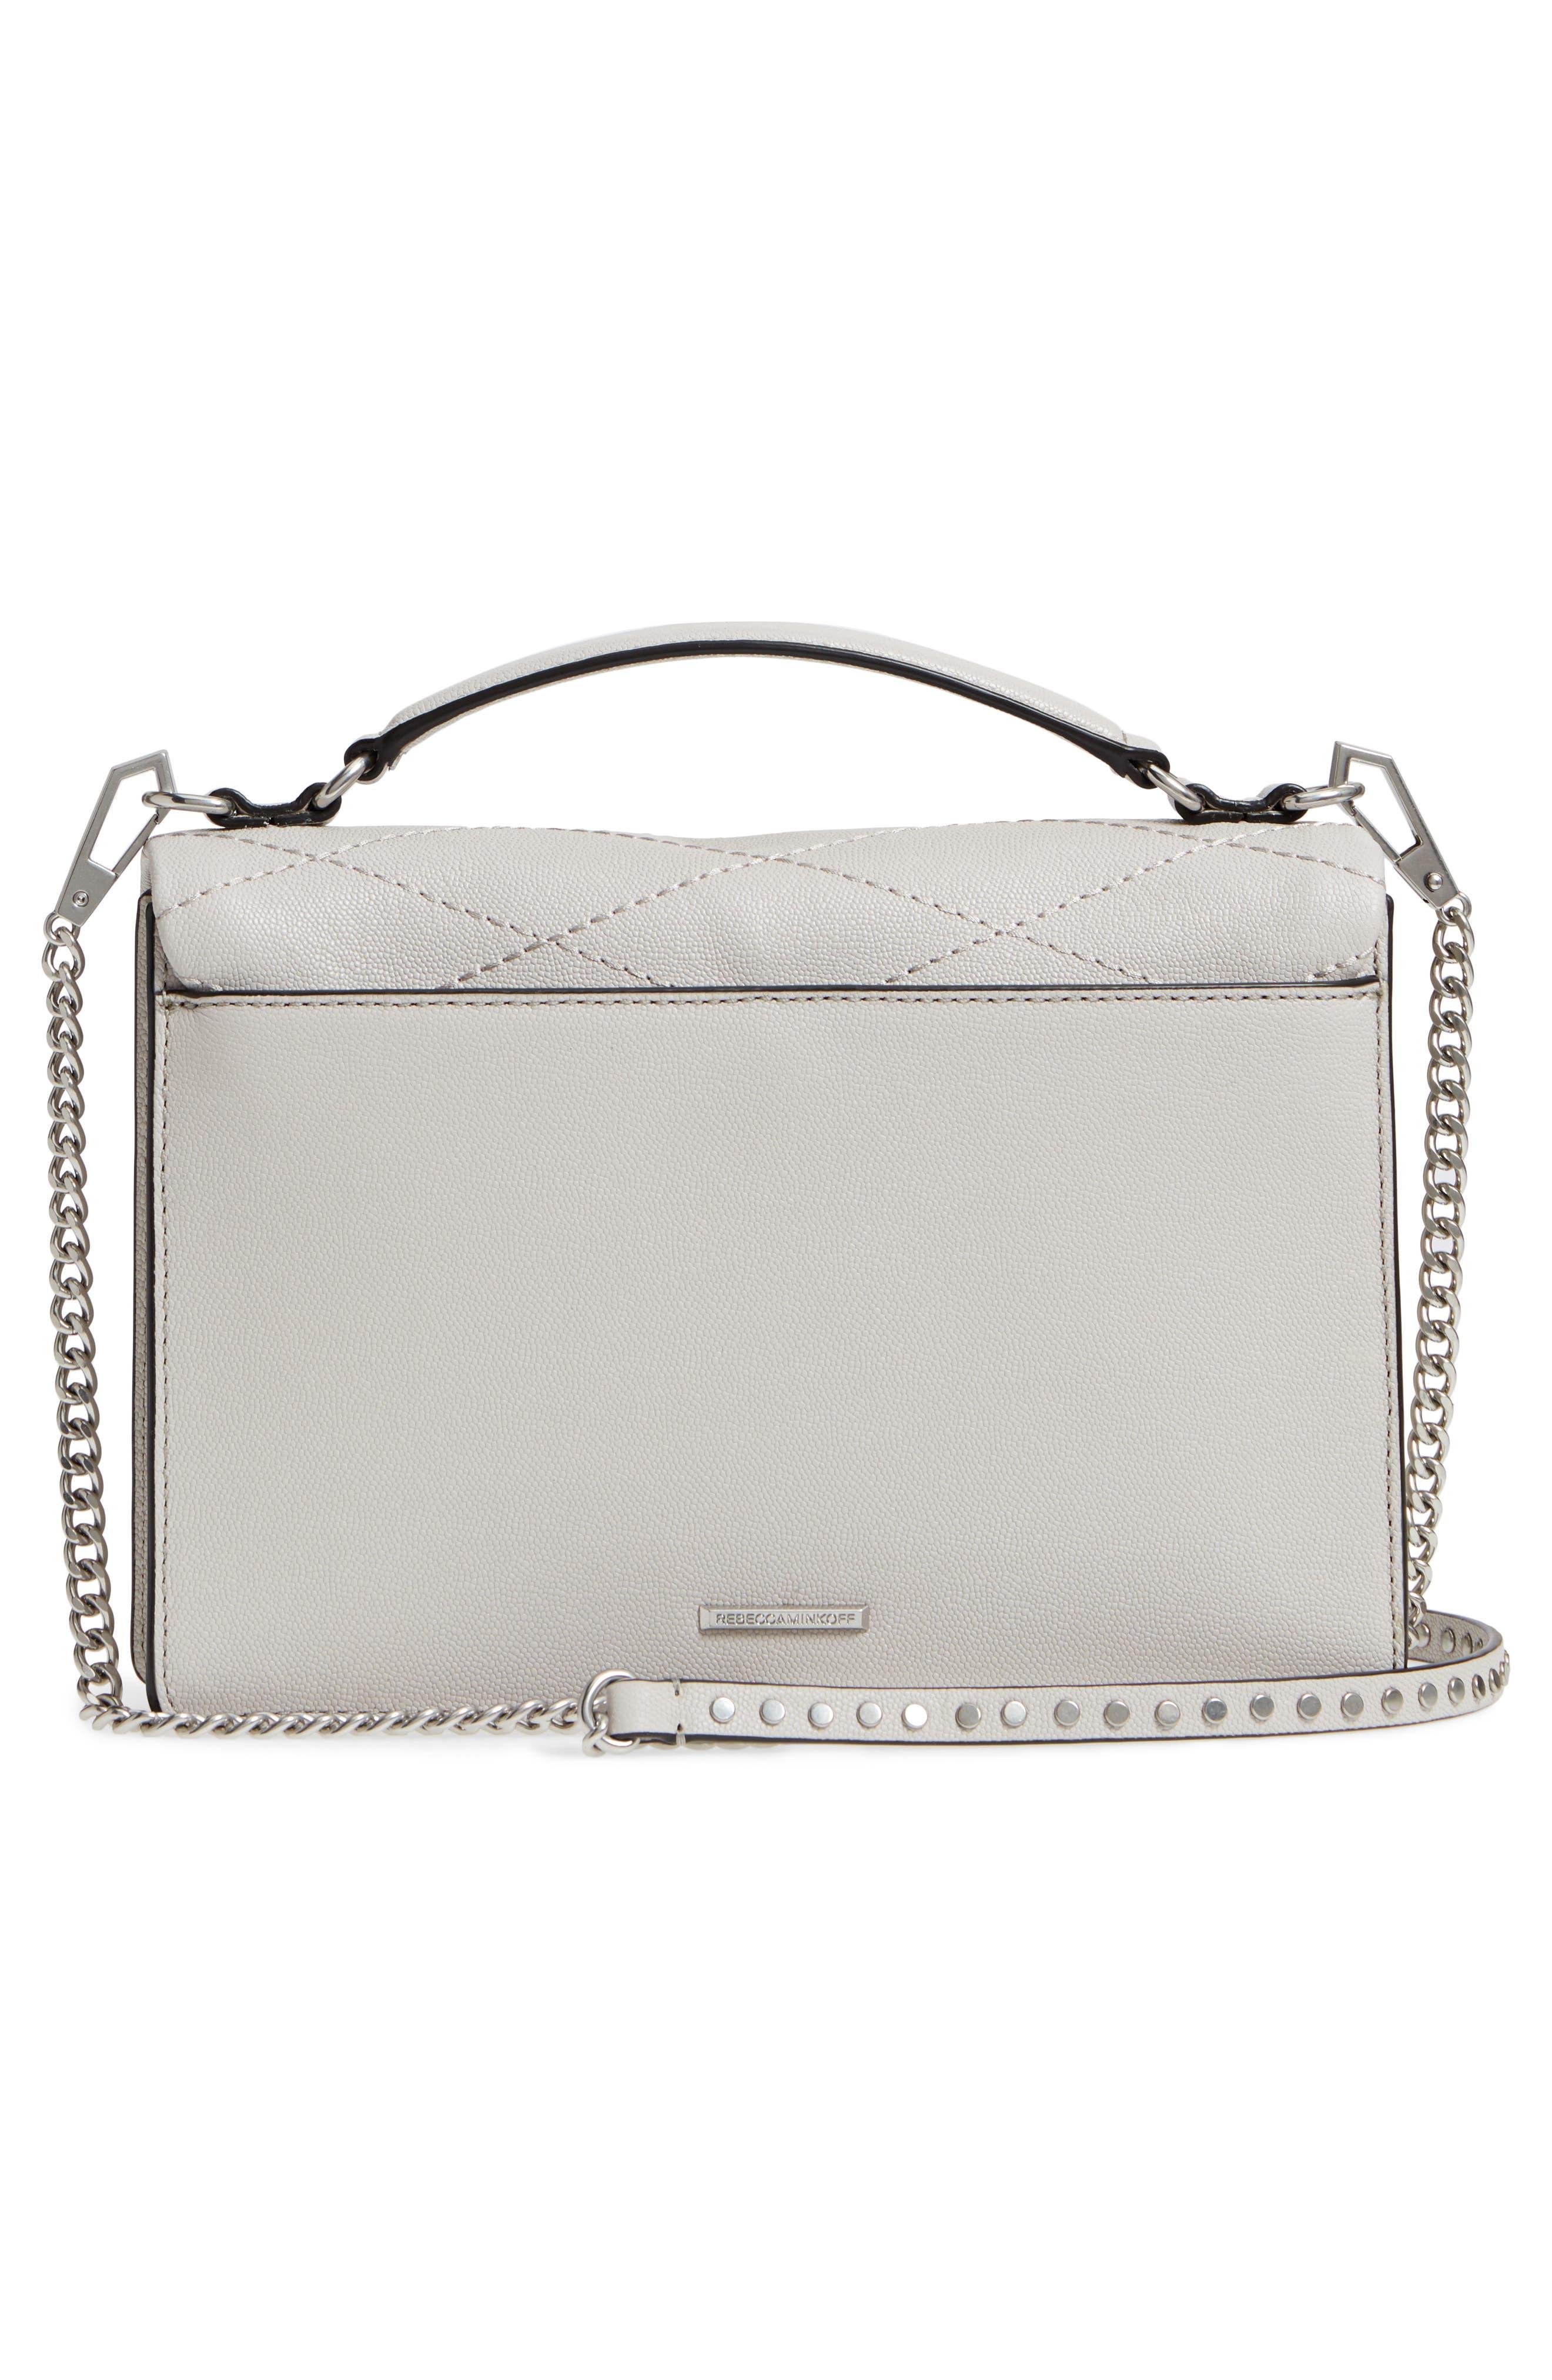 Medium Je T'aime Convertible Leather Crossbody Bag,                             Alternate thumbnail 30, color,